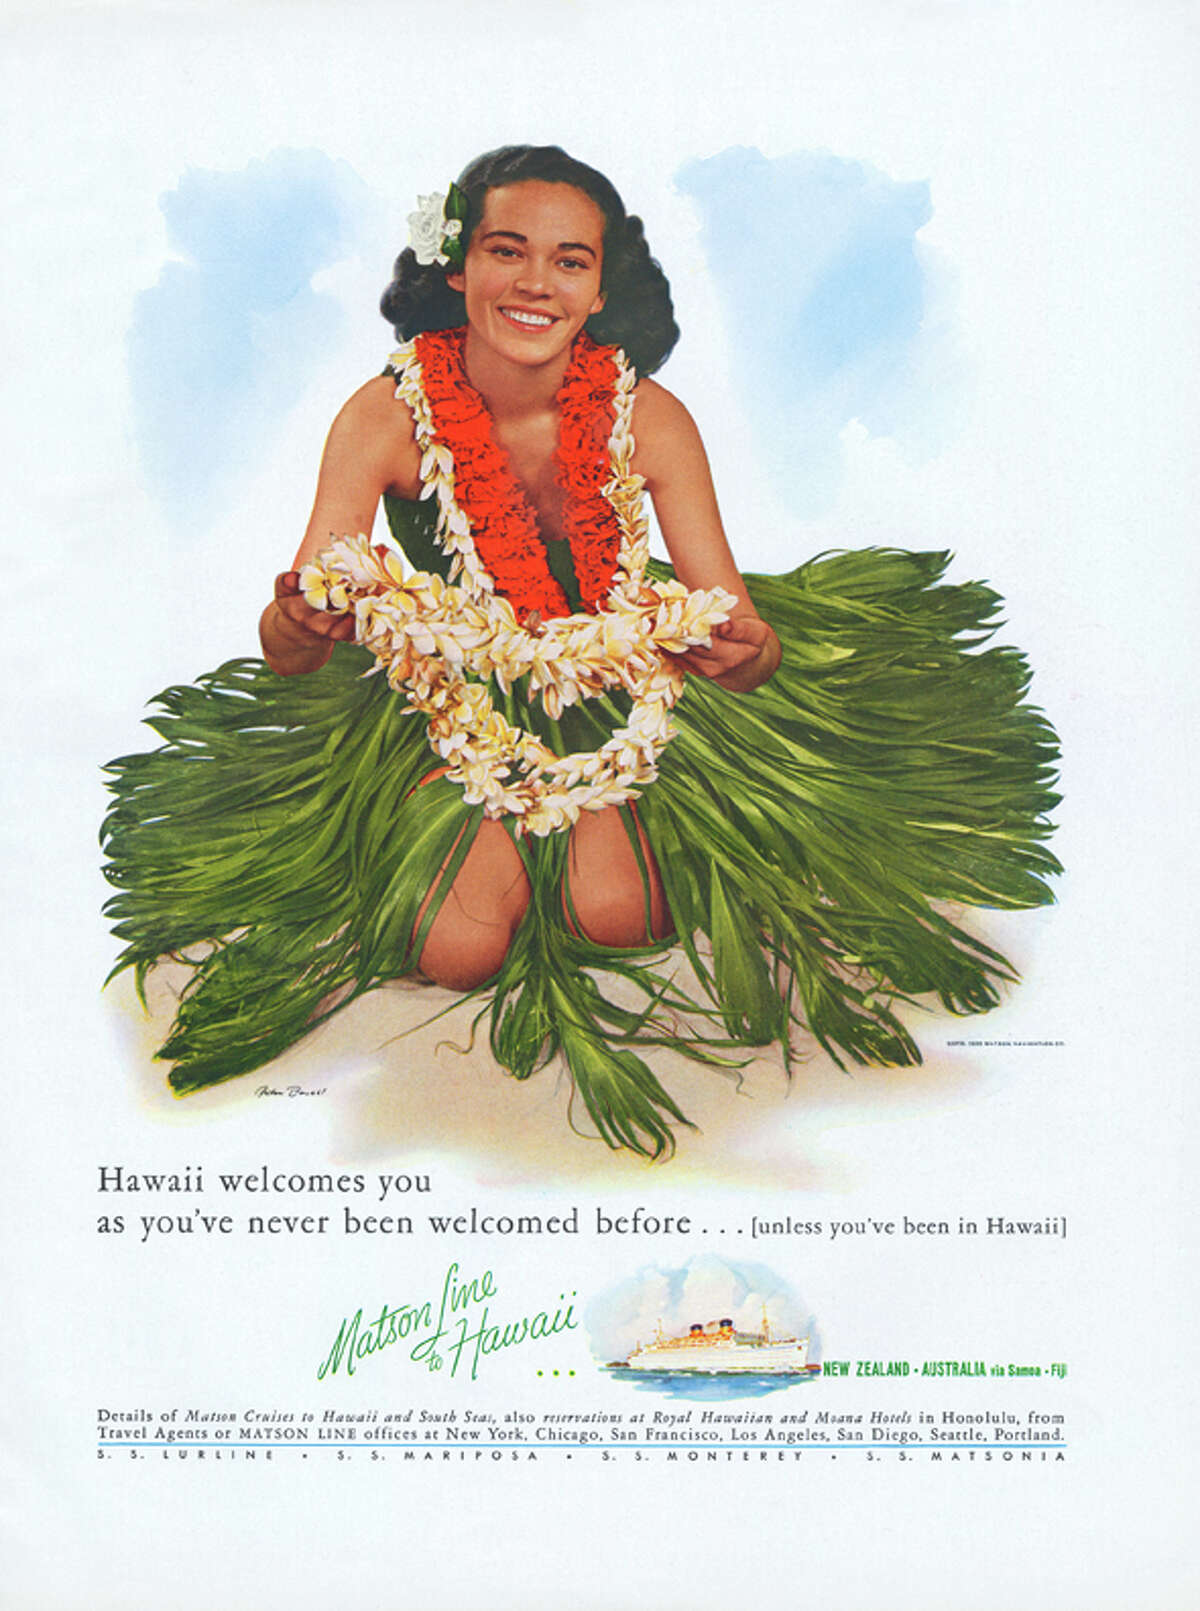 Hawaii welcomes you: Celebrity photographer Anton Bruehl